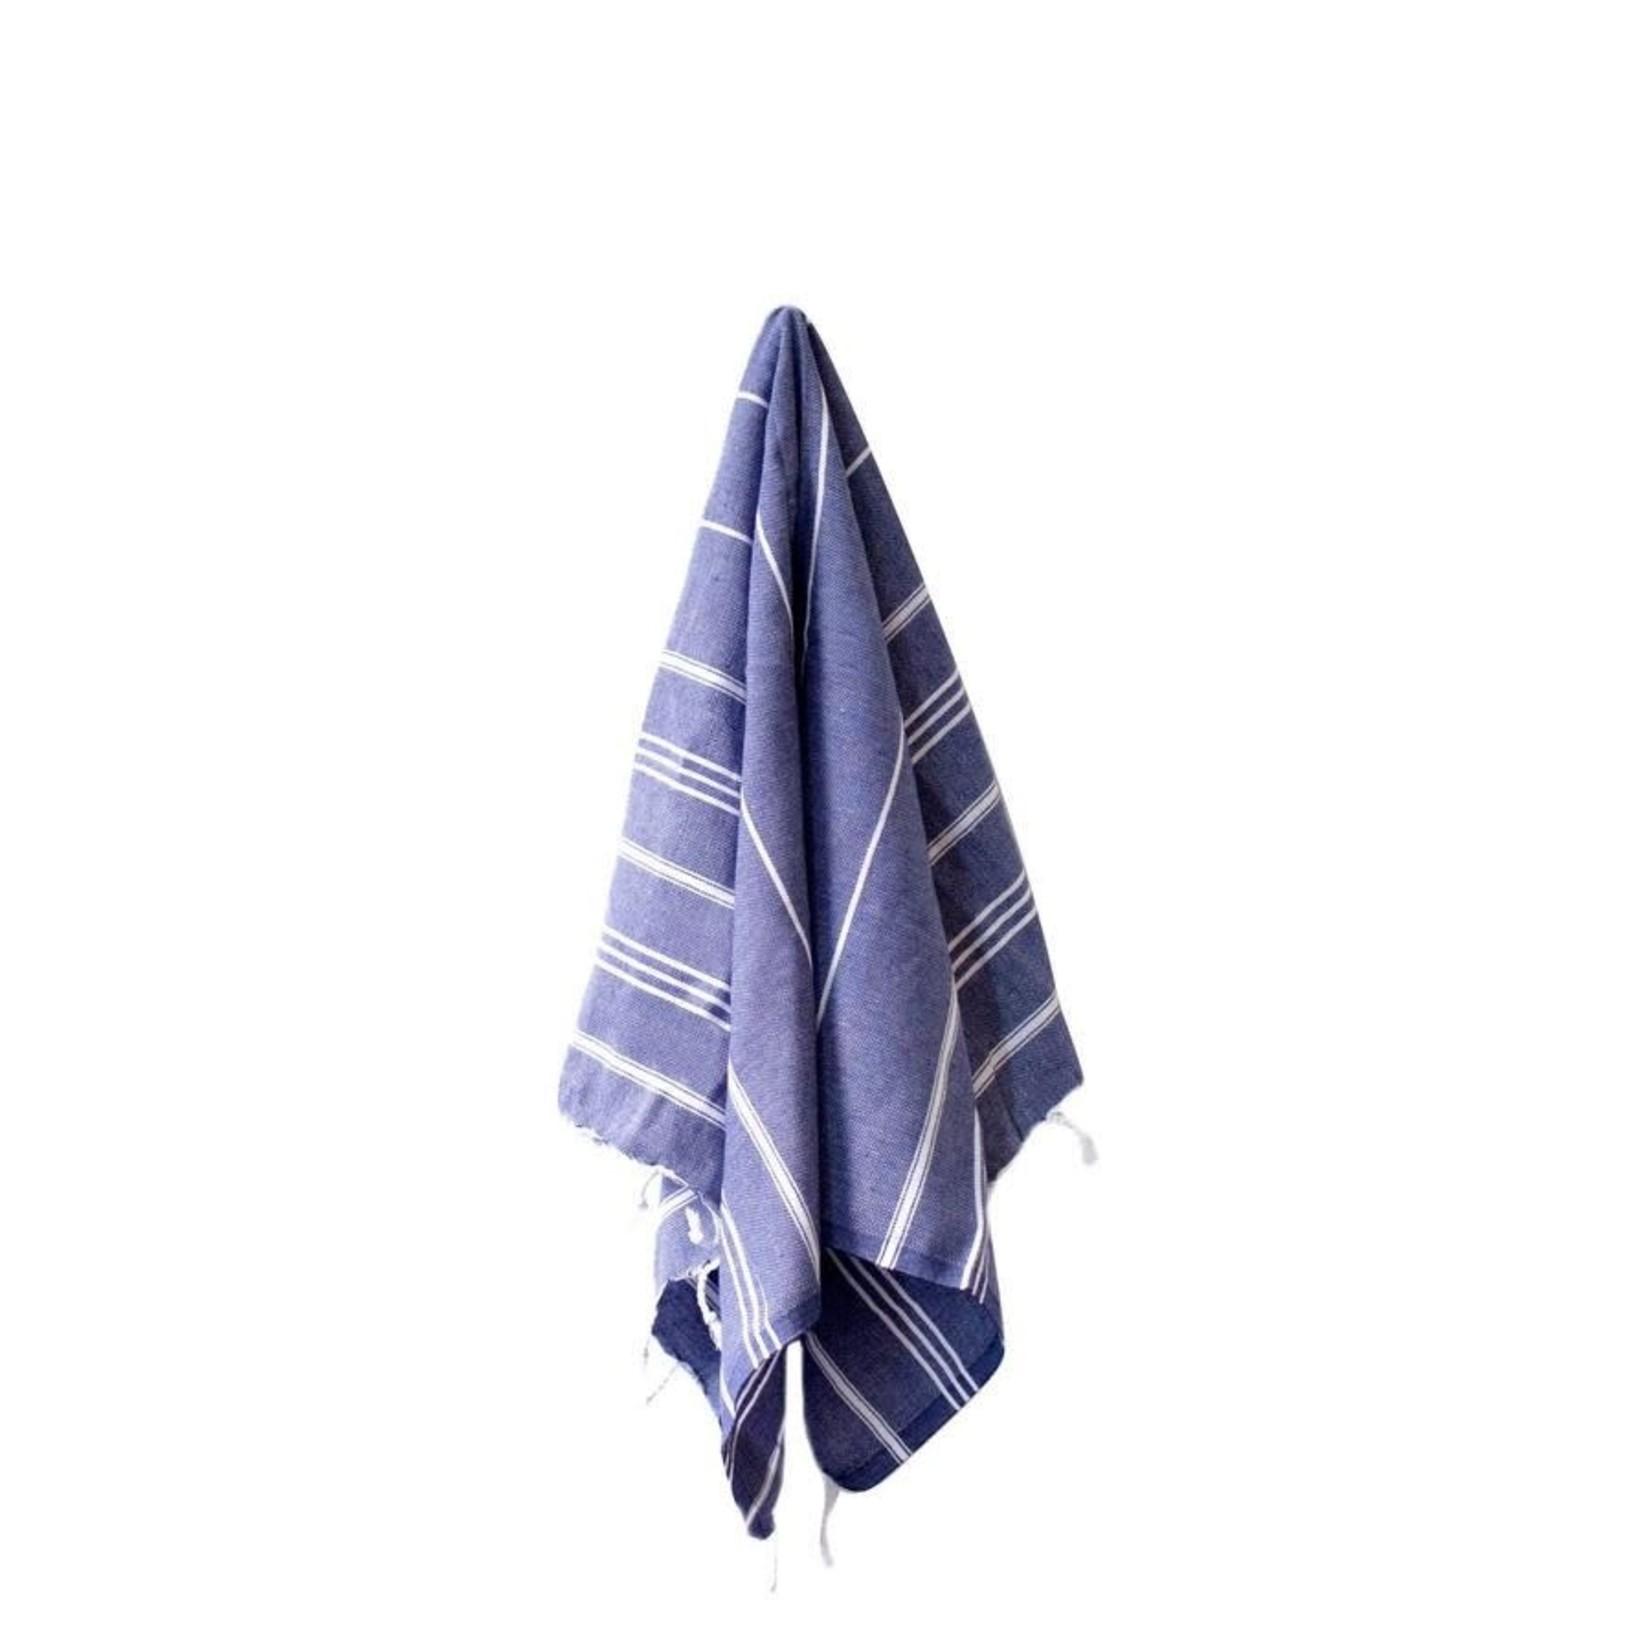 STRAY + WANDER MARIN SMALL TOWEL - DENIM